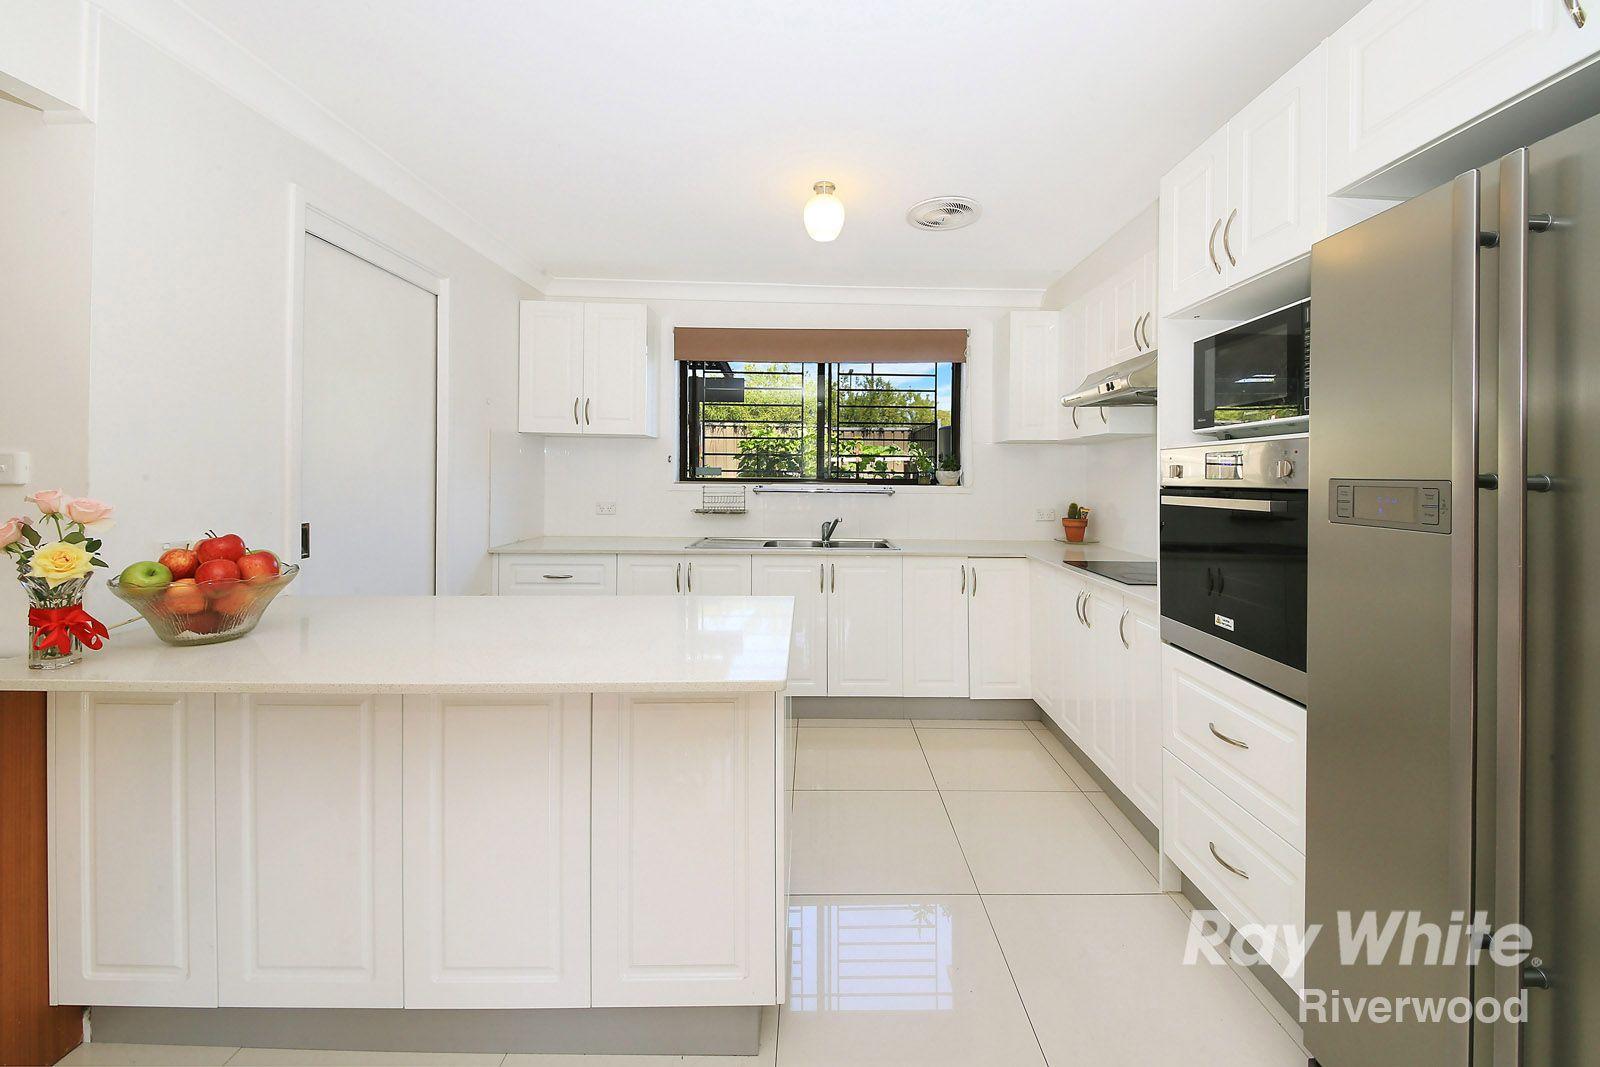 3/30A Keats Ave, Riverwood NSW 2210, Image 1